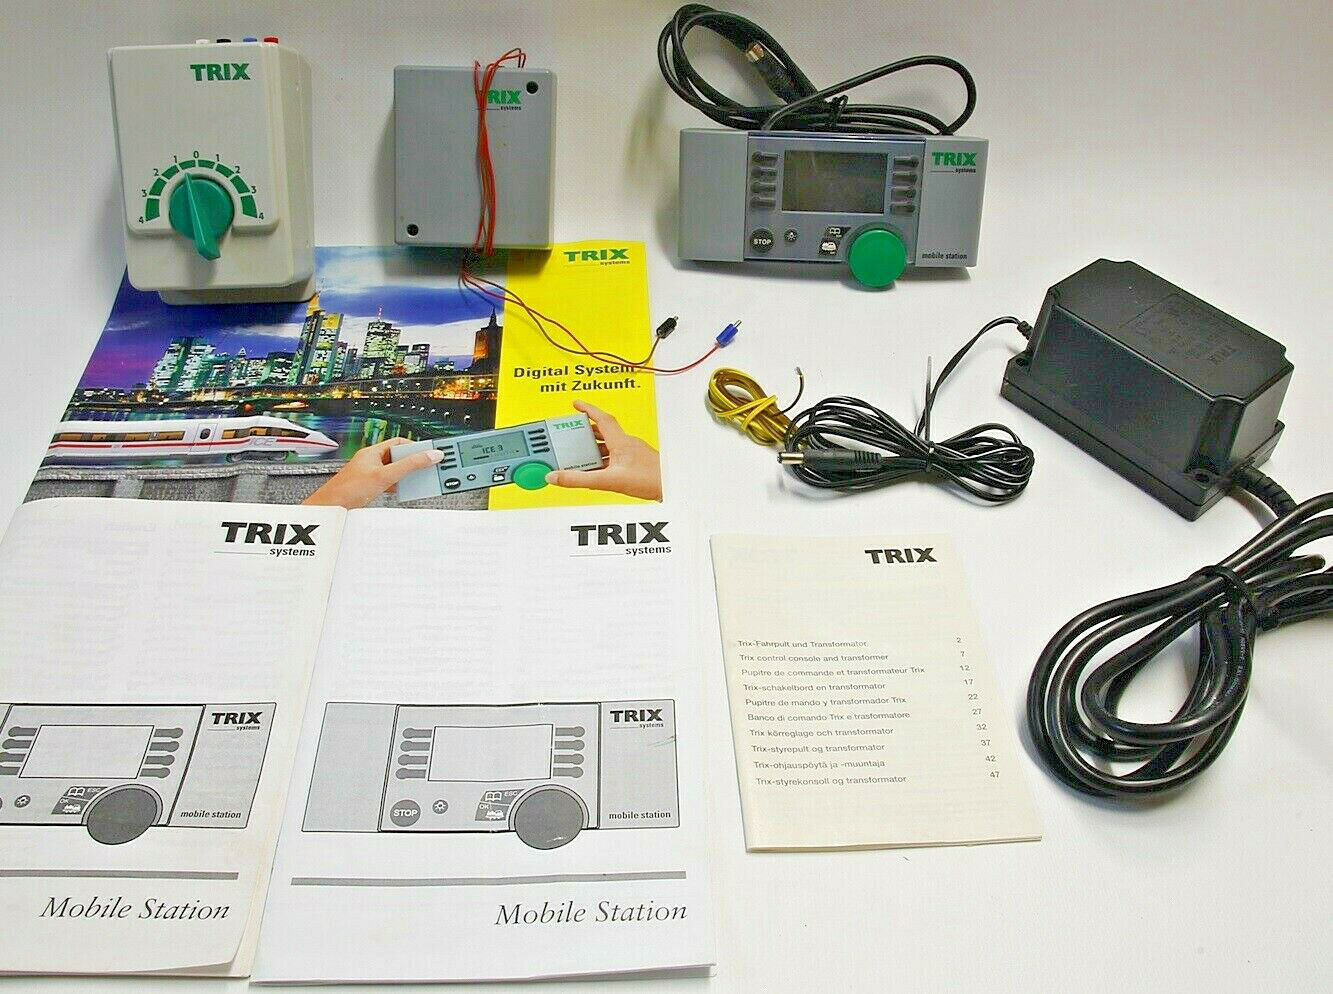 N escala 1 160 Trix Selectrix trenes transformer, 309701, mobile station, lote